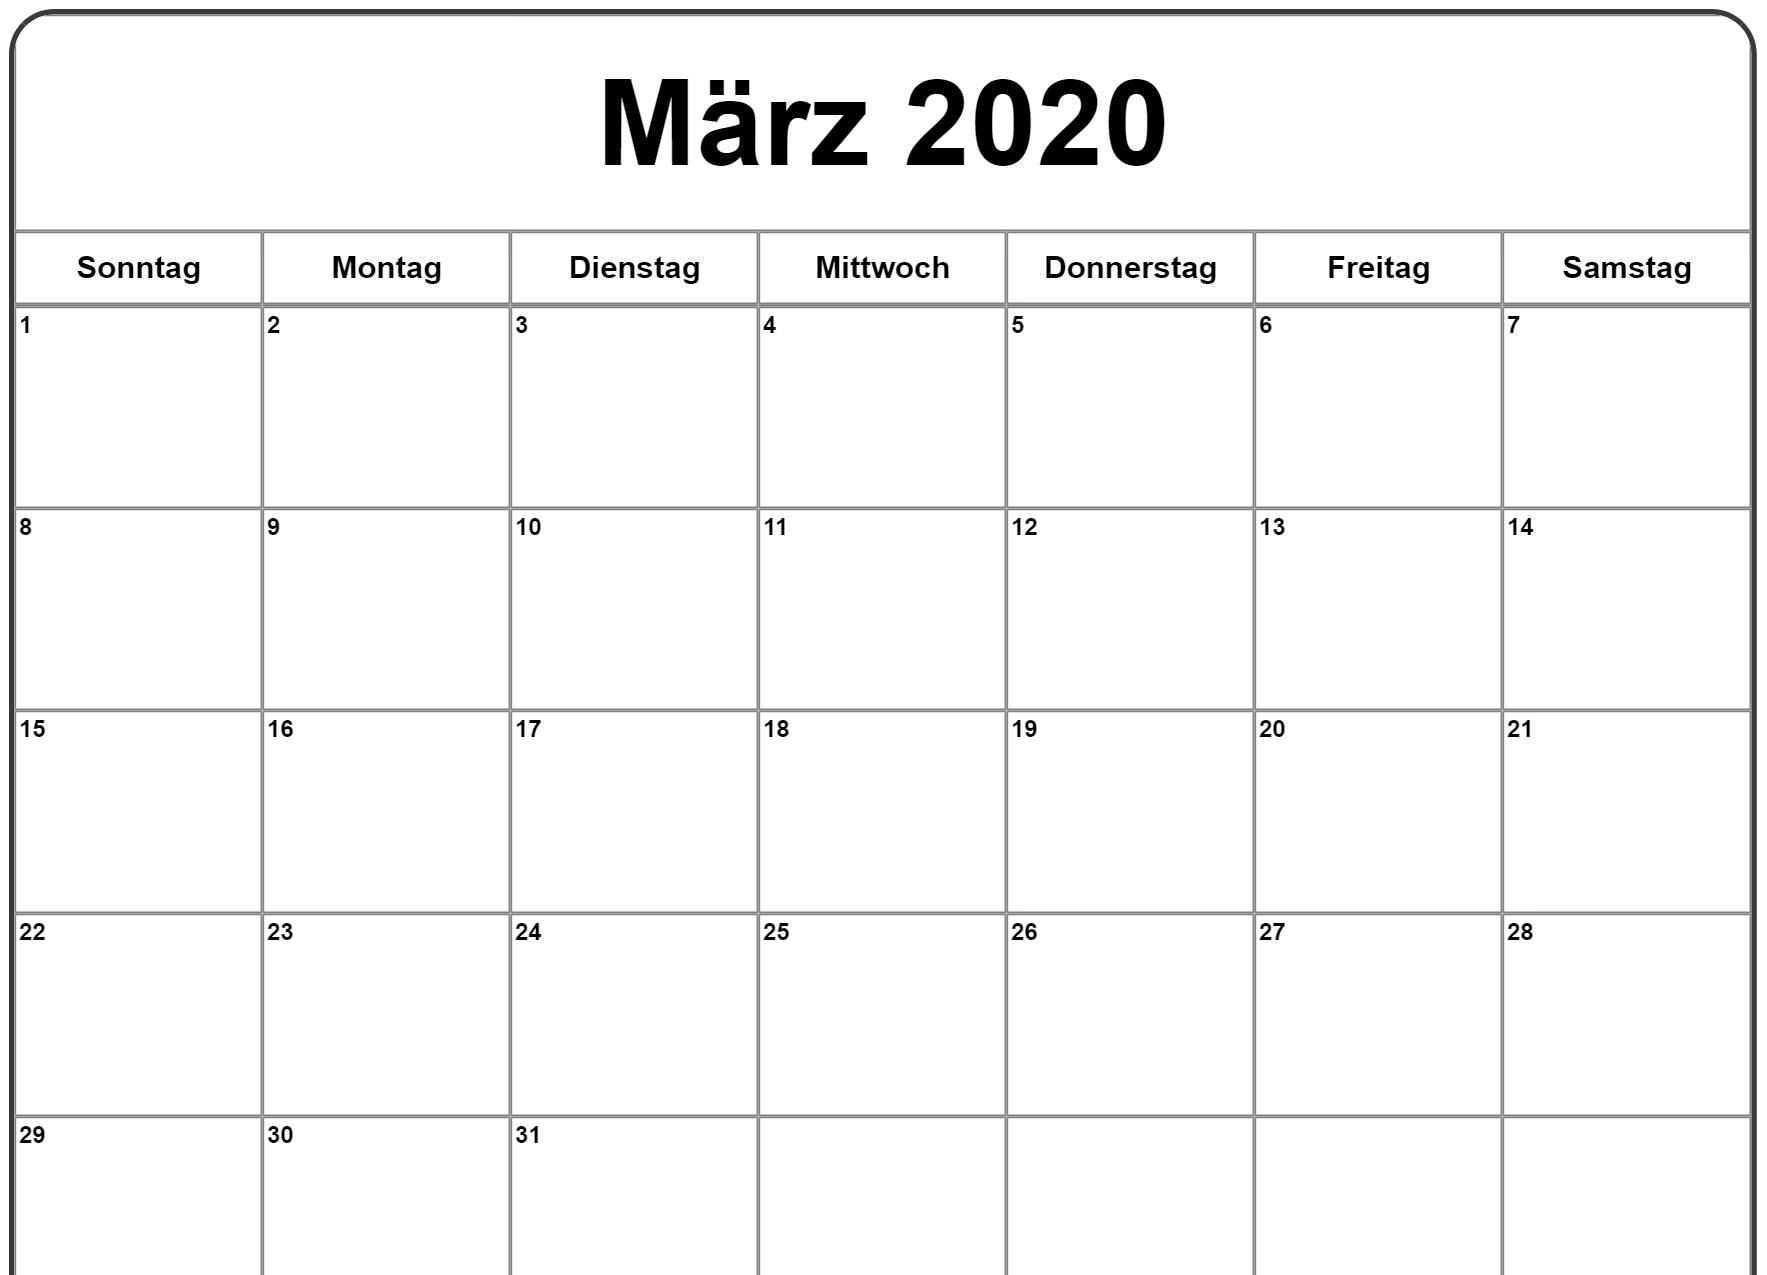 Marz 2020 Kalender Kalender 2019 Kalender Kalender Vorlagen